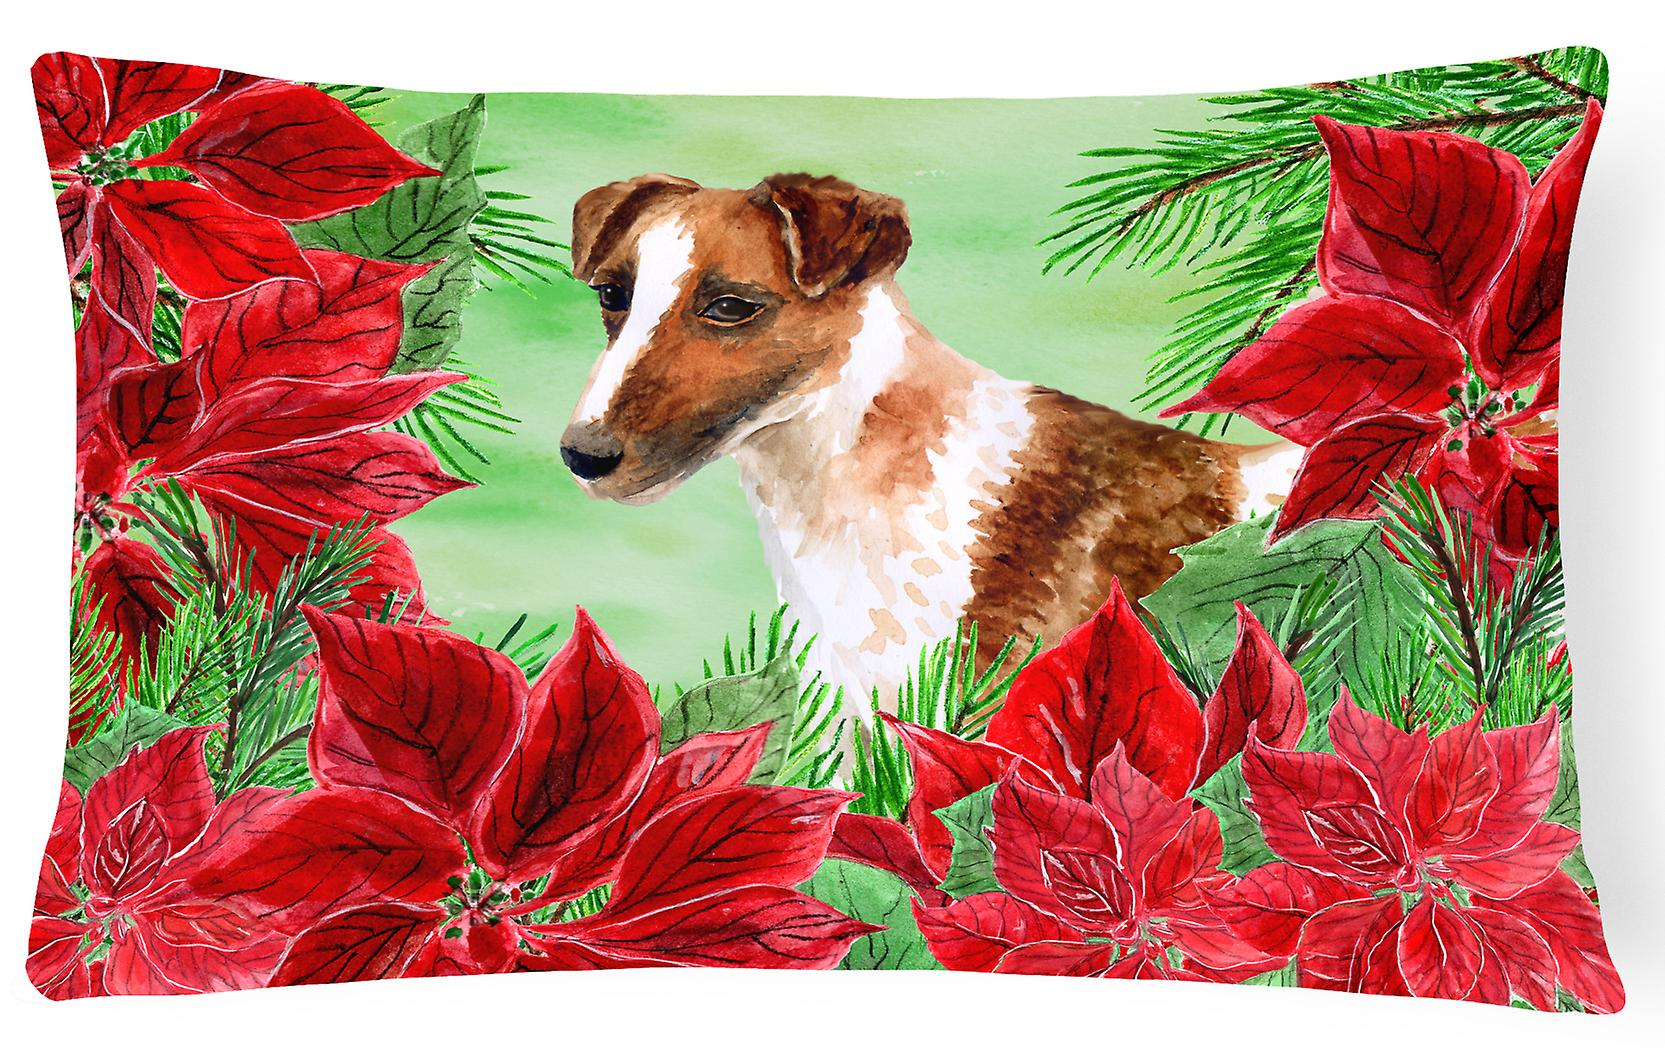 Fox Canvas Decorative Smooth Pillow Poinsettas Fabric Terrier uKl5Fc3T1J